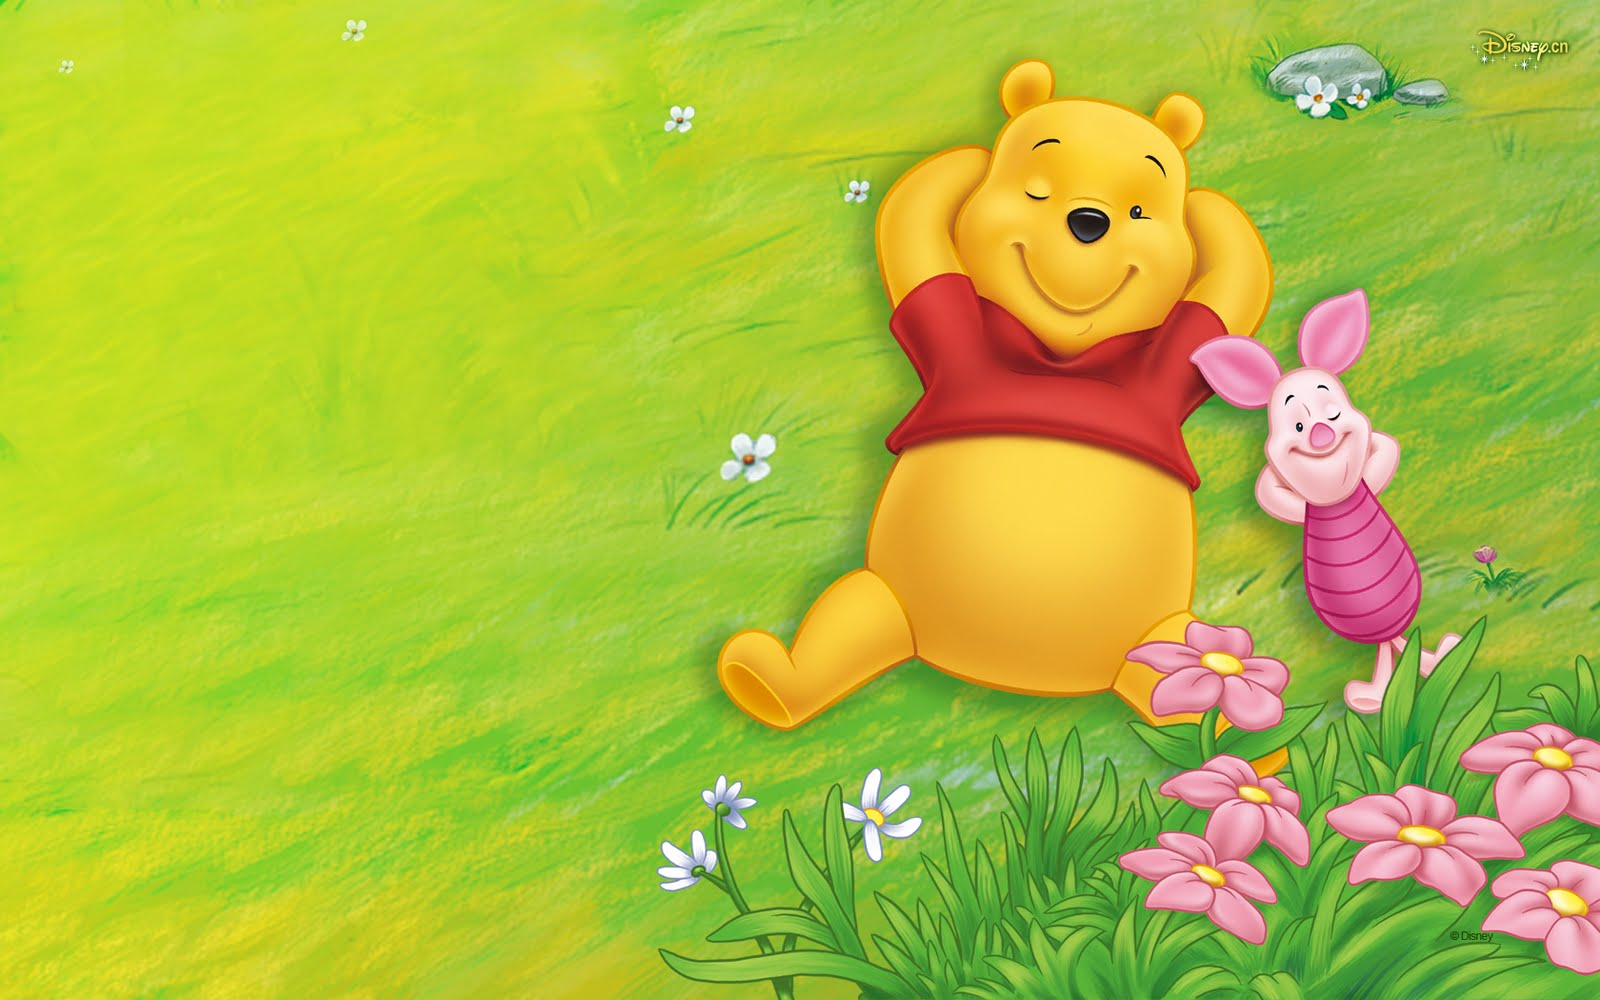 free image bank 25 im genes de disney winnie pooh incluye navide as. Black Bedroom Furniture Sets. Home Design Ideas